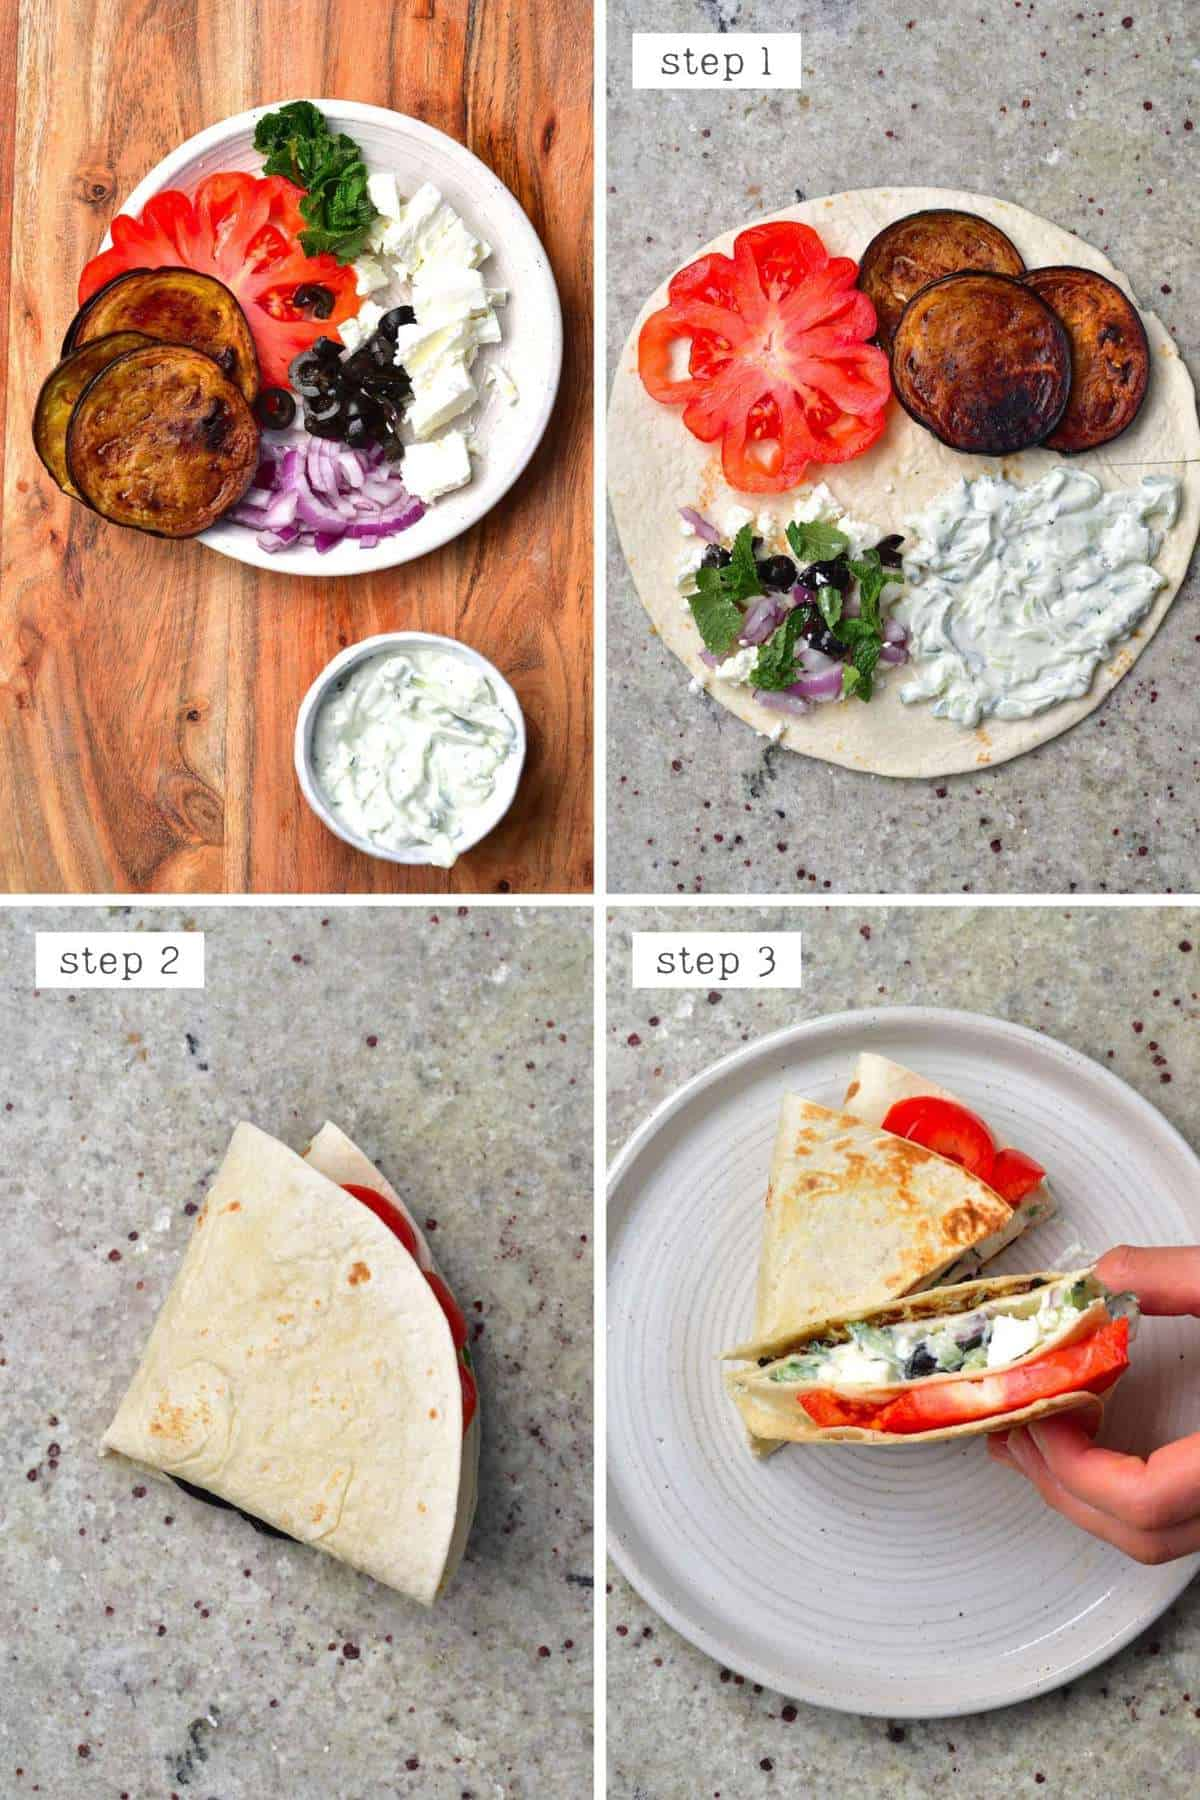 Steps for making an eggplant tortilla - Greece tortilla